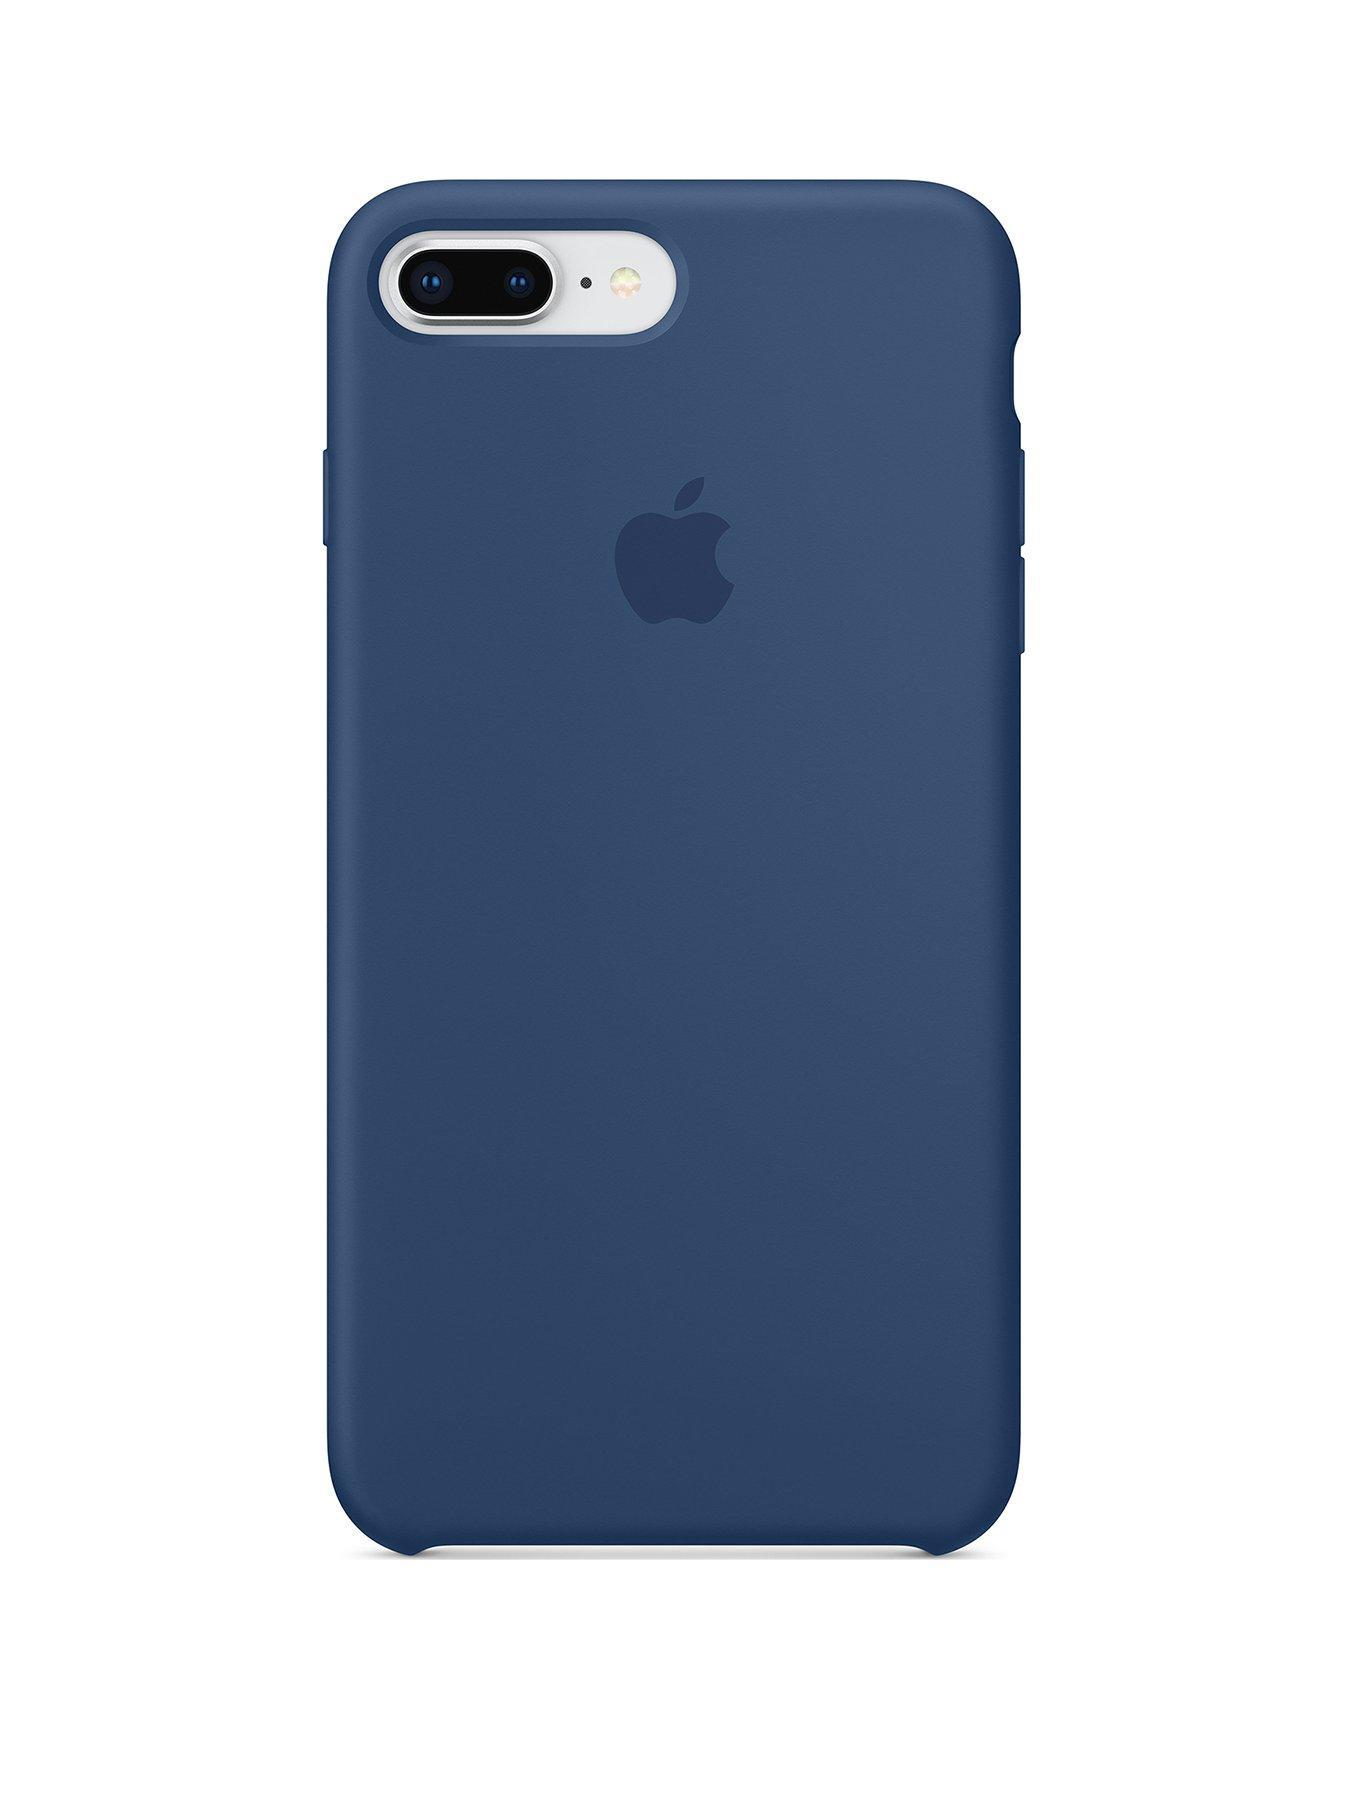 sports shoes 0fb74 45838 Details about Apple Silicone Case for iPhone 8 Plus / 7 Plus - Blue Cobalt  - Currys